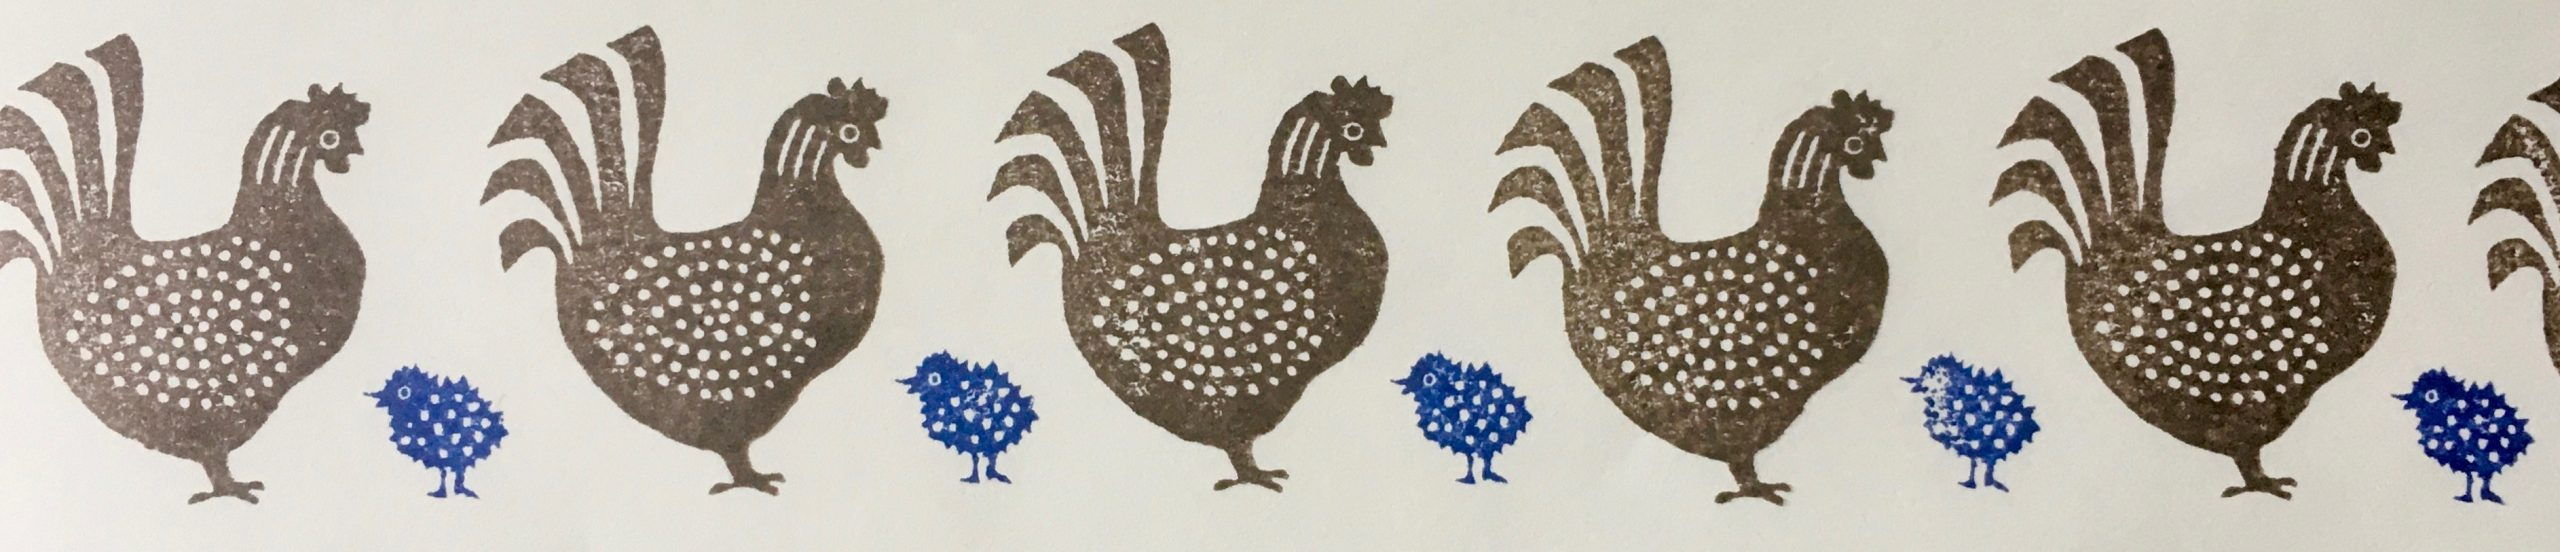 Cambridge Imprint Speckled Hen border